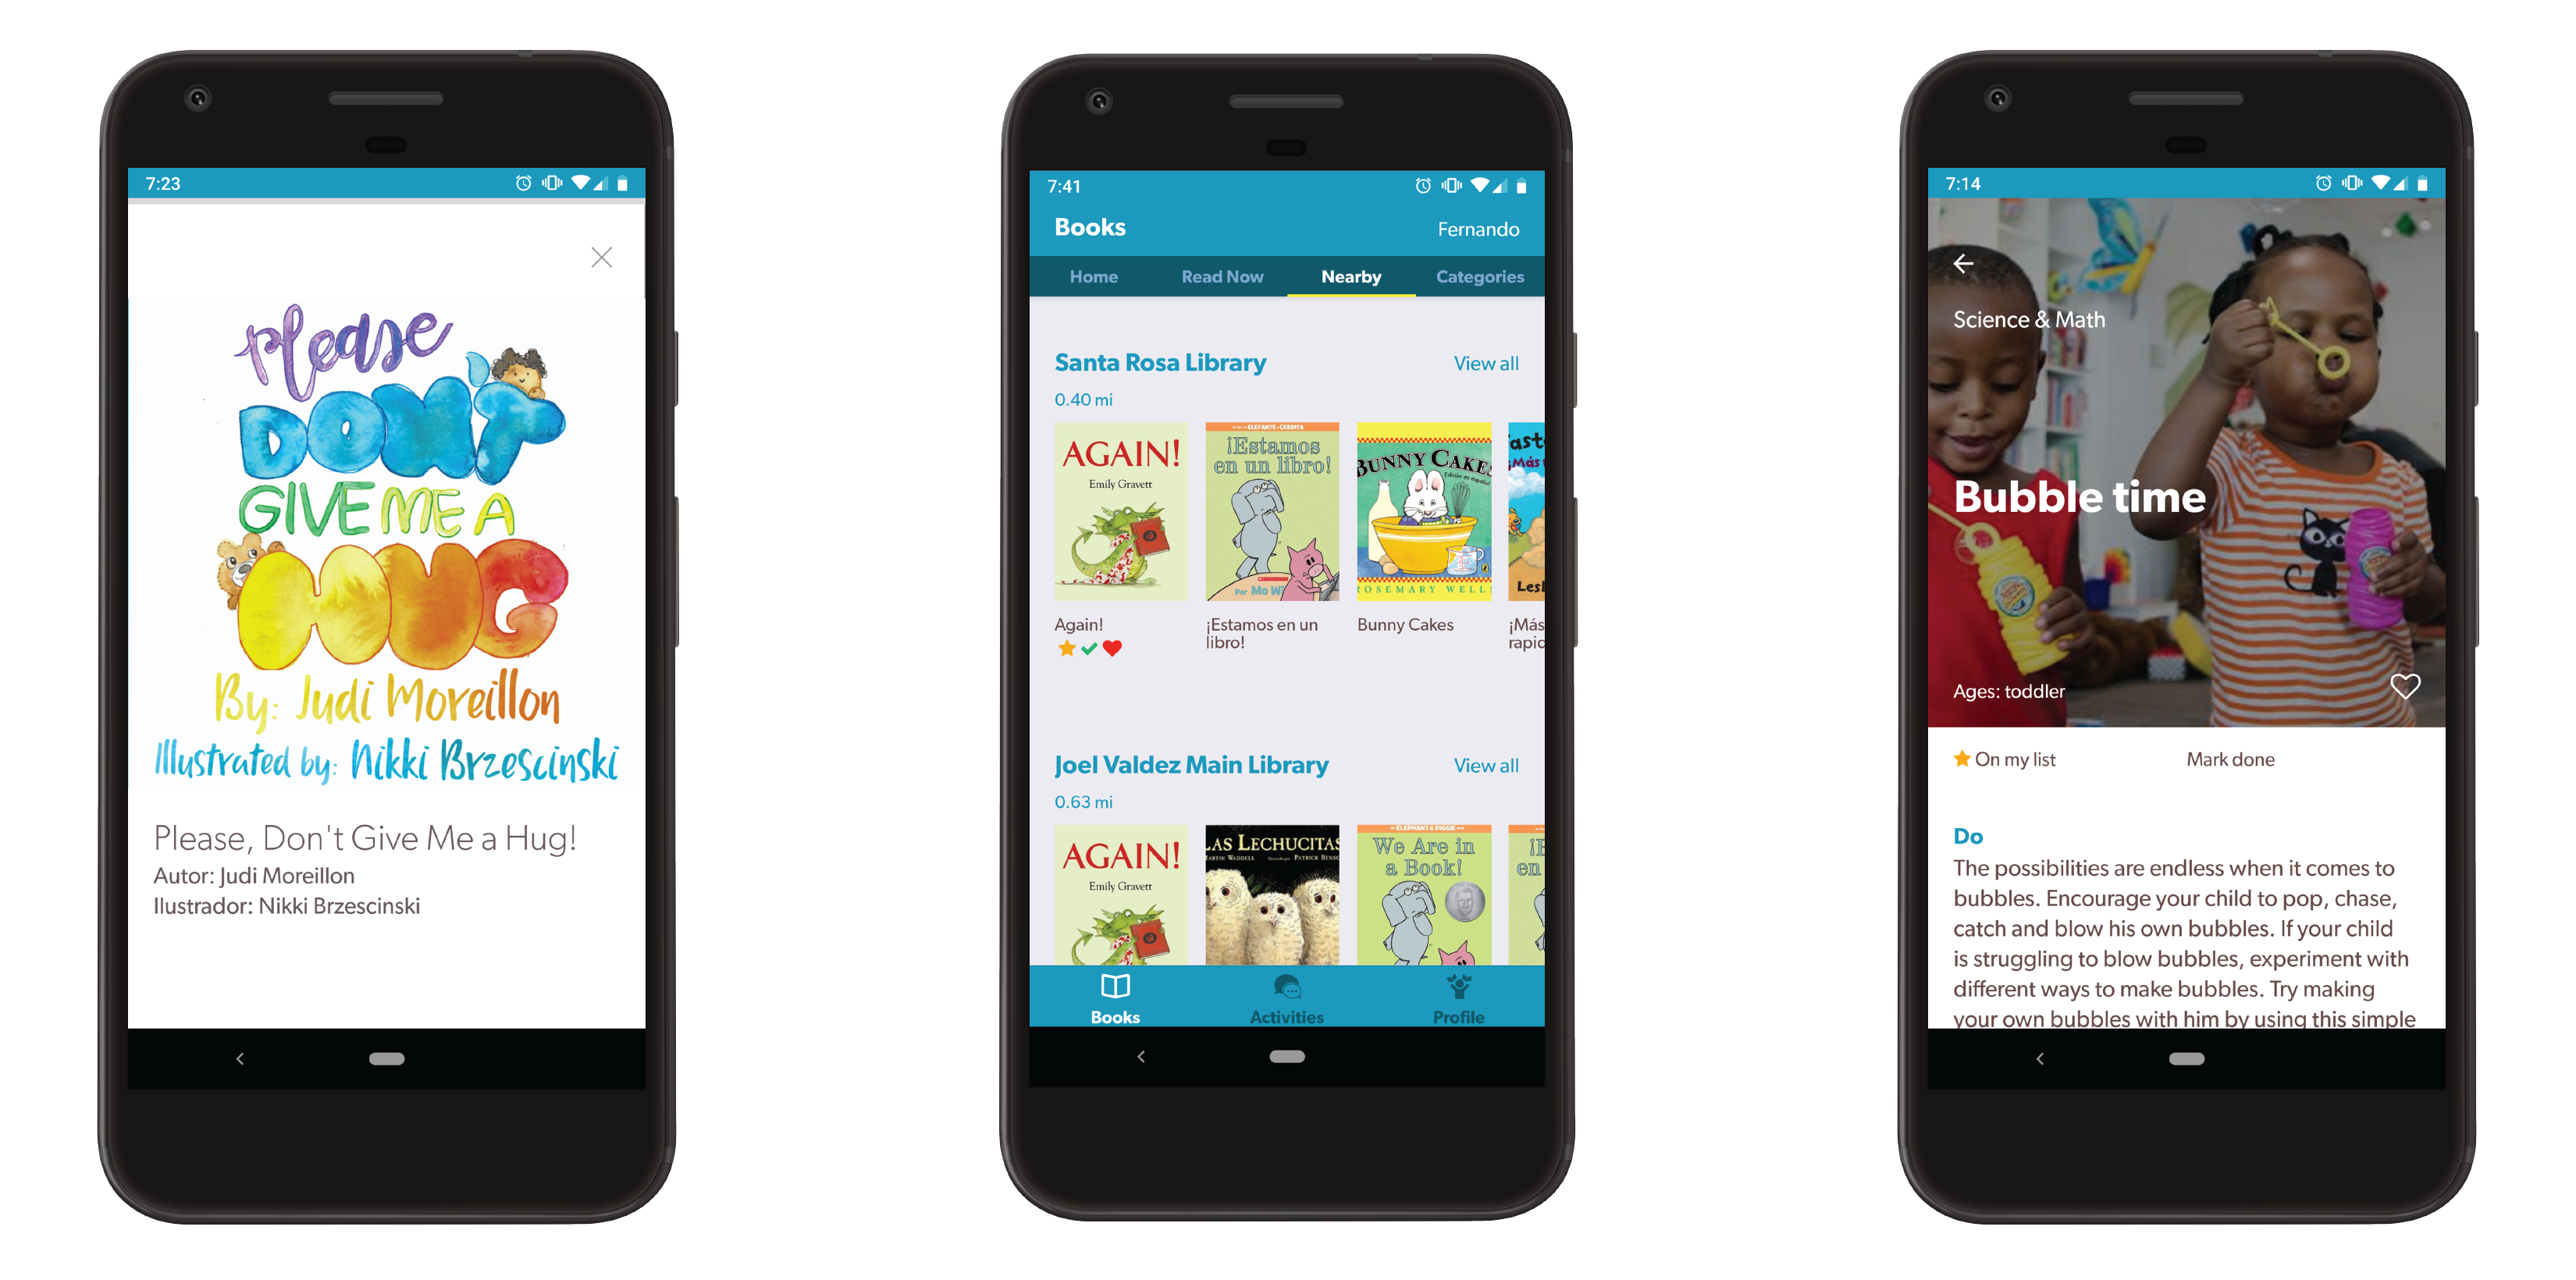 Make Way for Books App